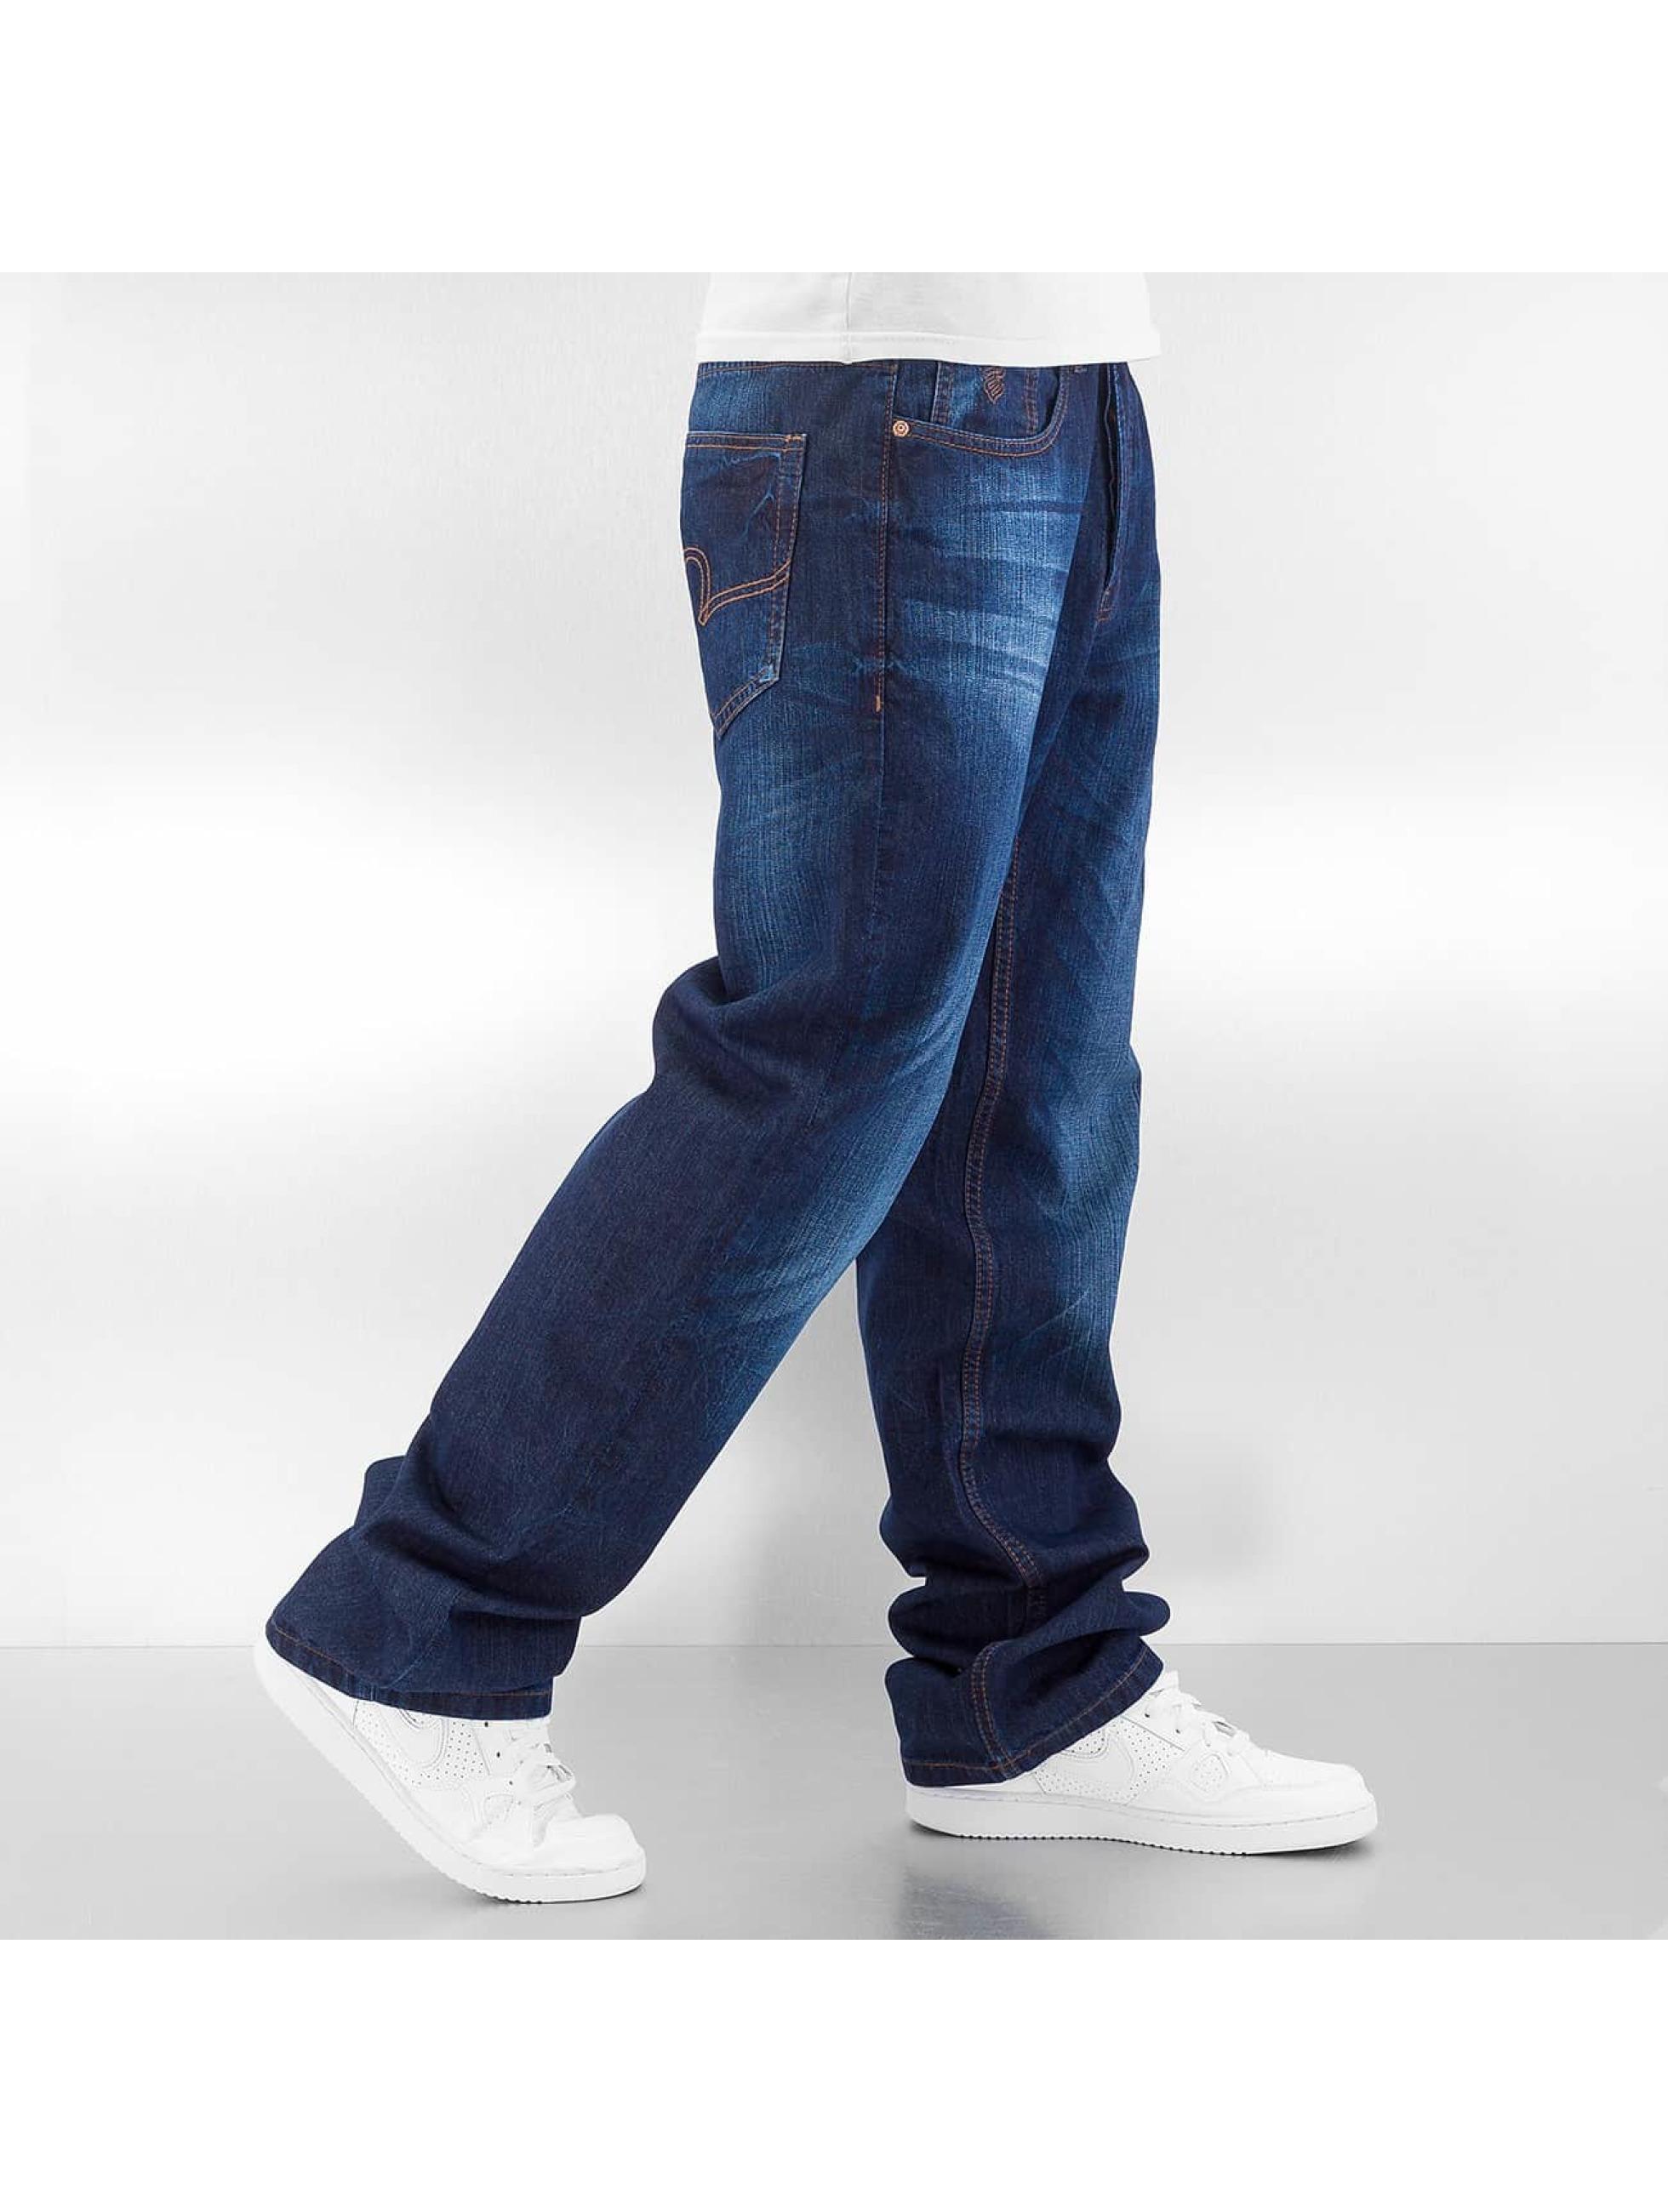 Rocawear Джинсы-трубы Anniv Stitching синий